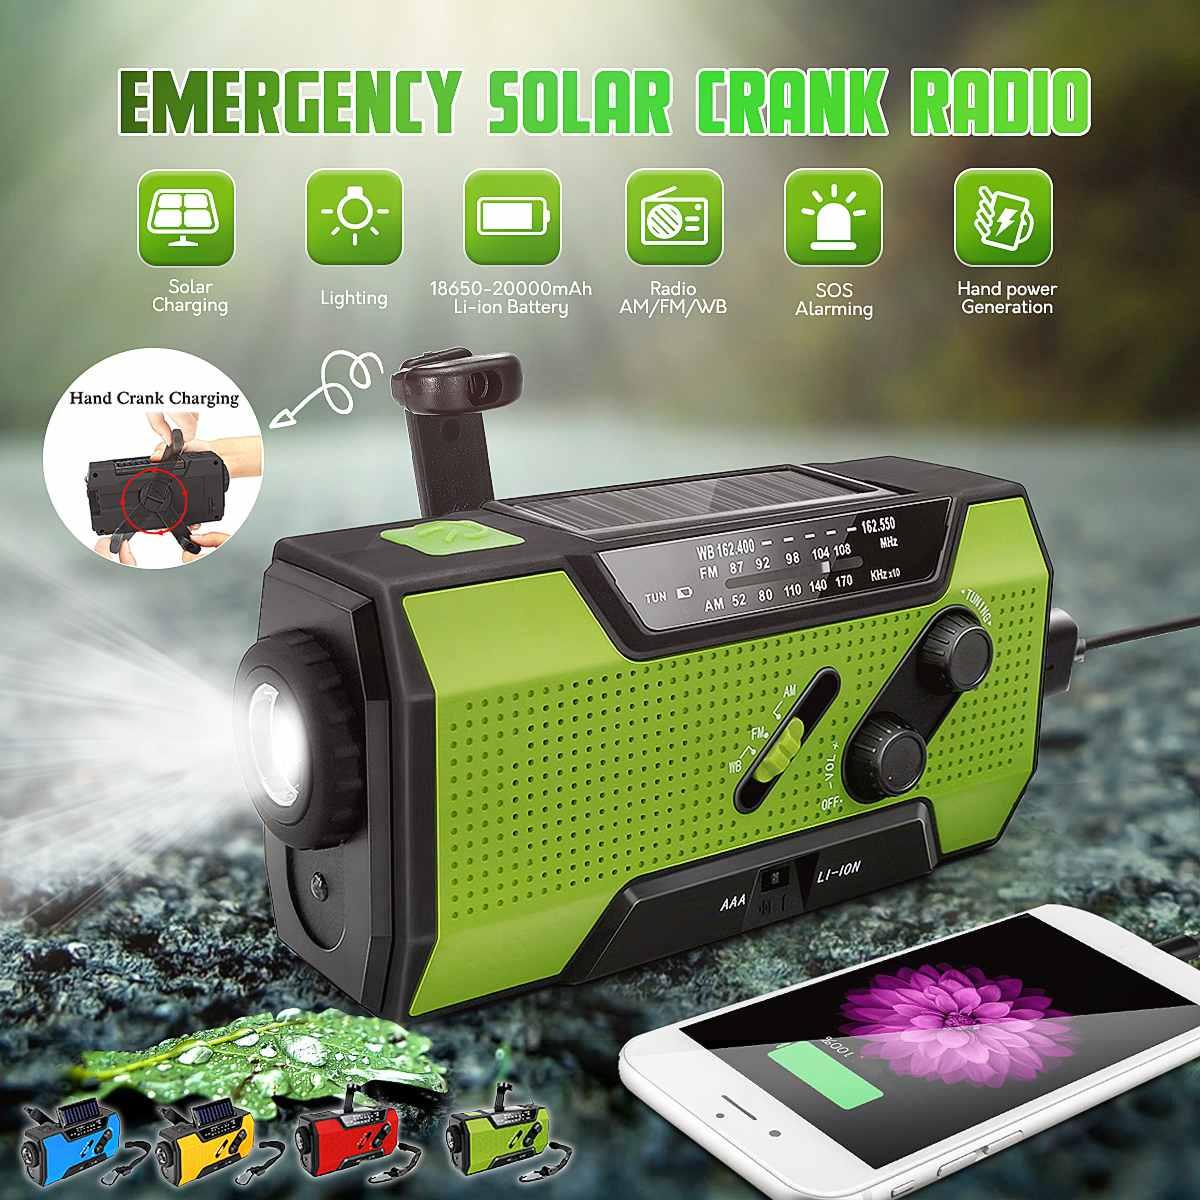 Leory wb manivela digital solar de emergência am/fm noaa tempo portátil rádio lanterna elétrica painel solar energia recarregável